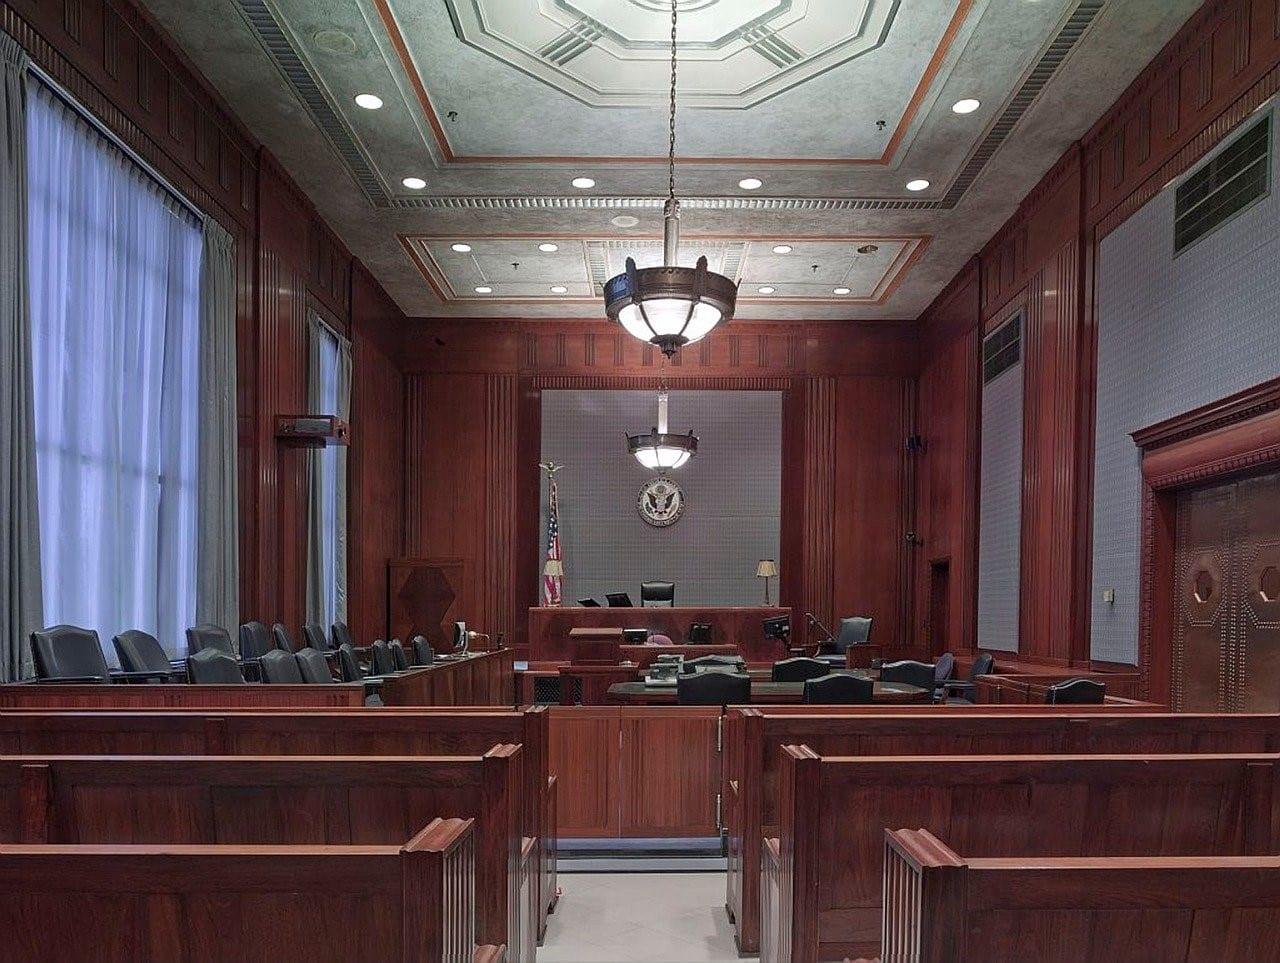 A California court room